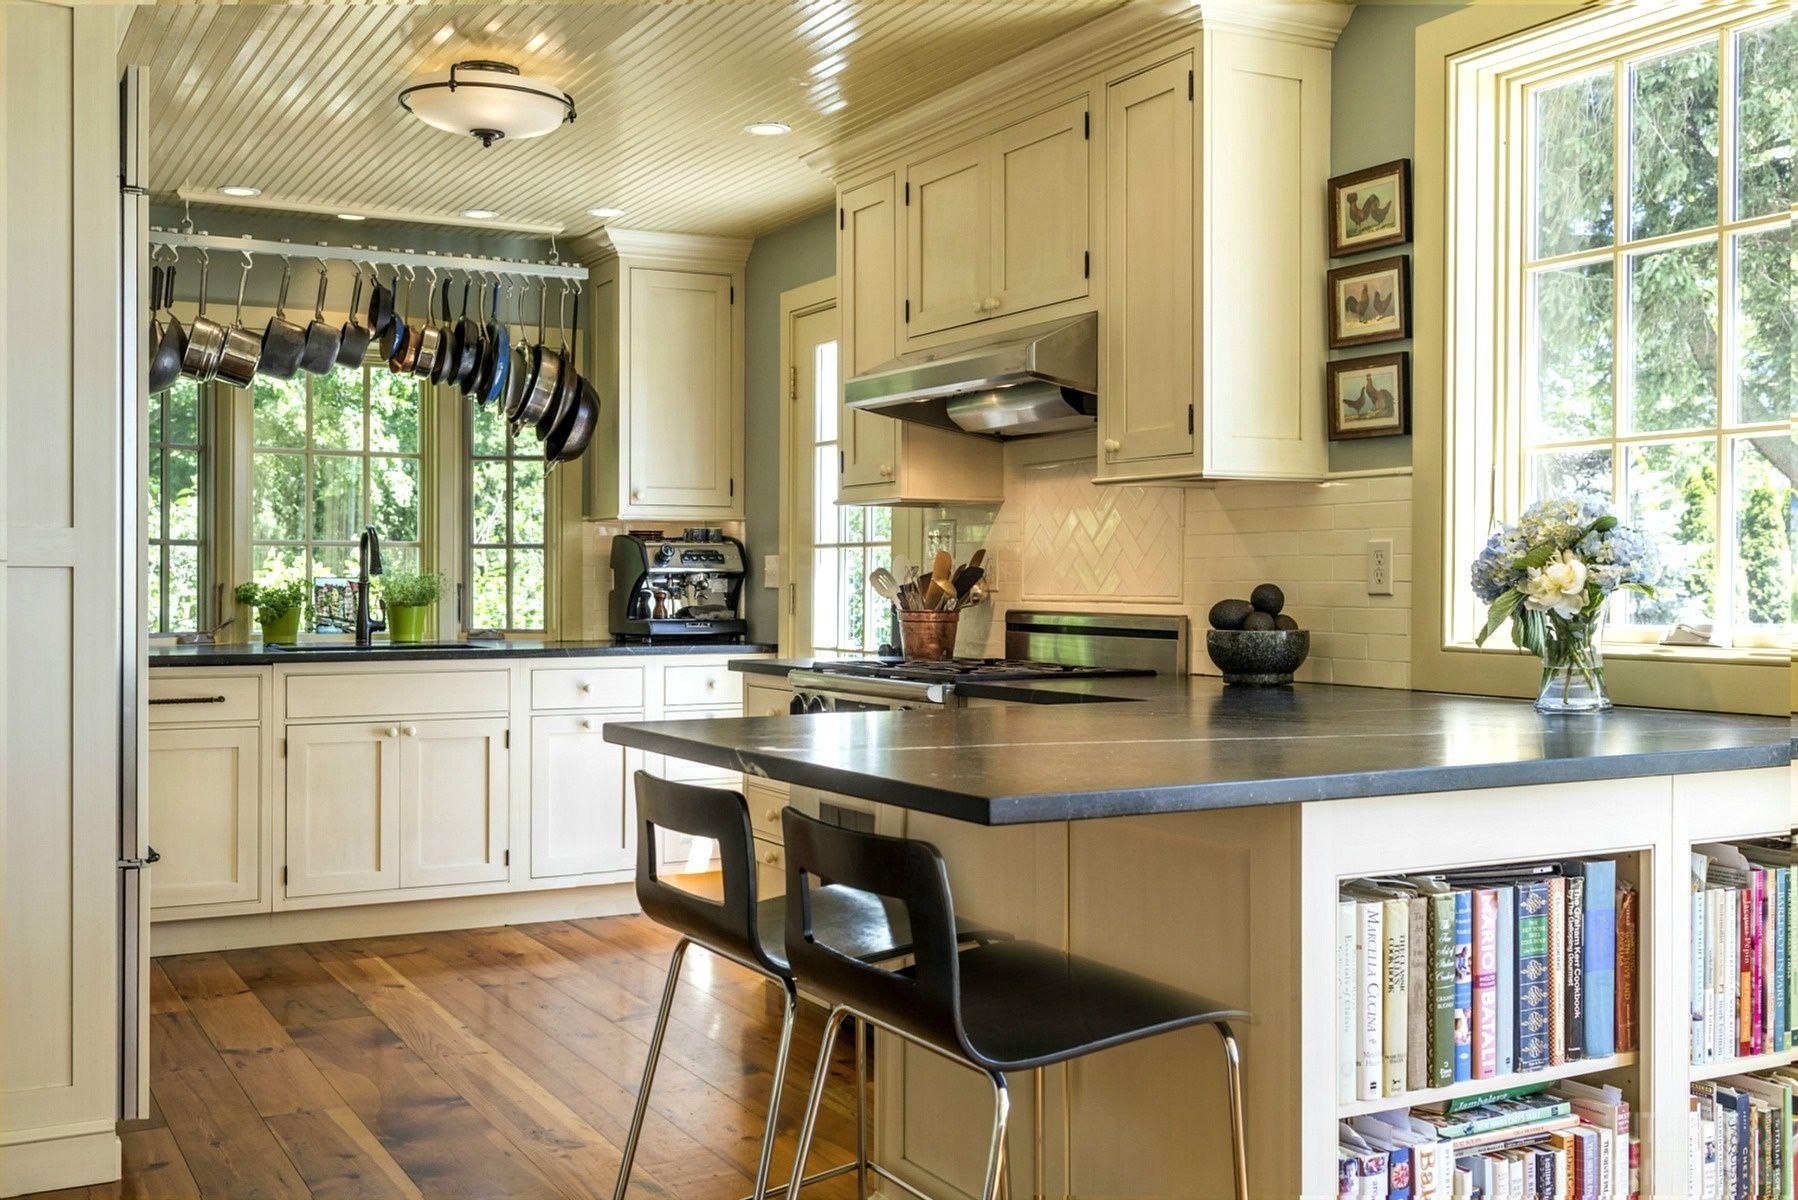 Best Historic Home Kitchen In Madison Ct Beautiful Kitchen 640 x 480